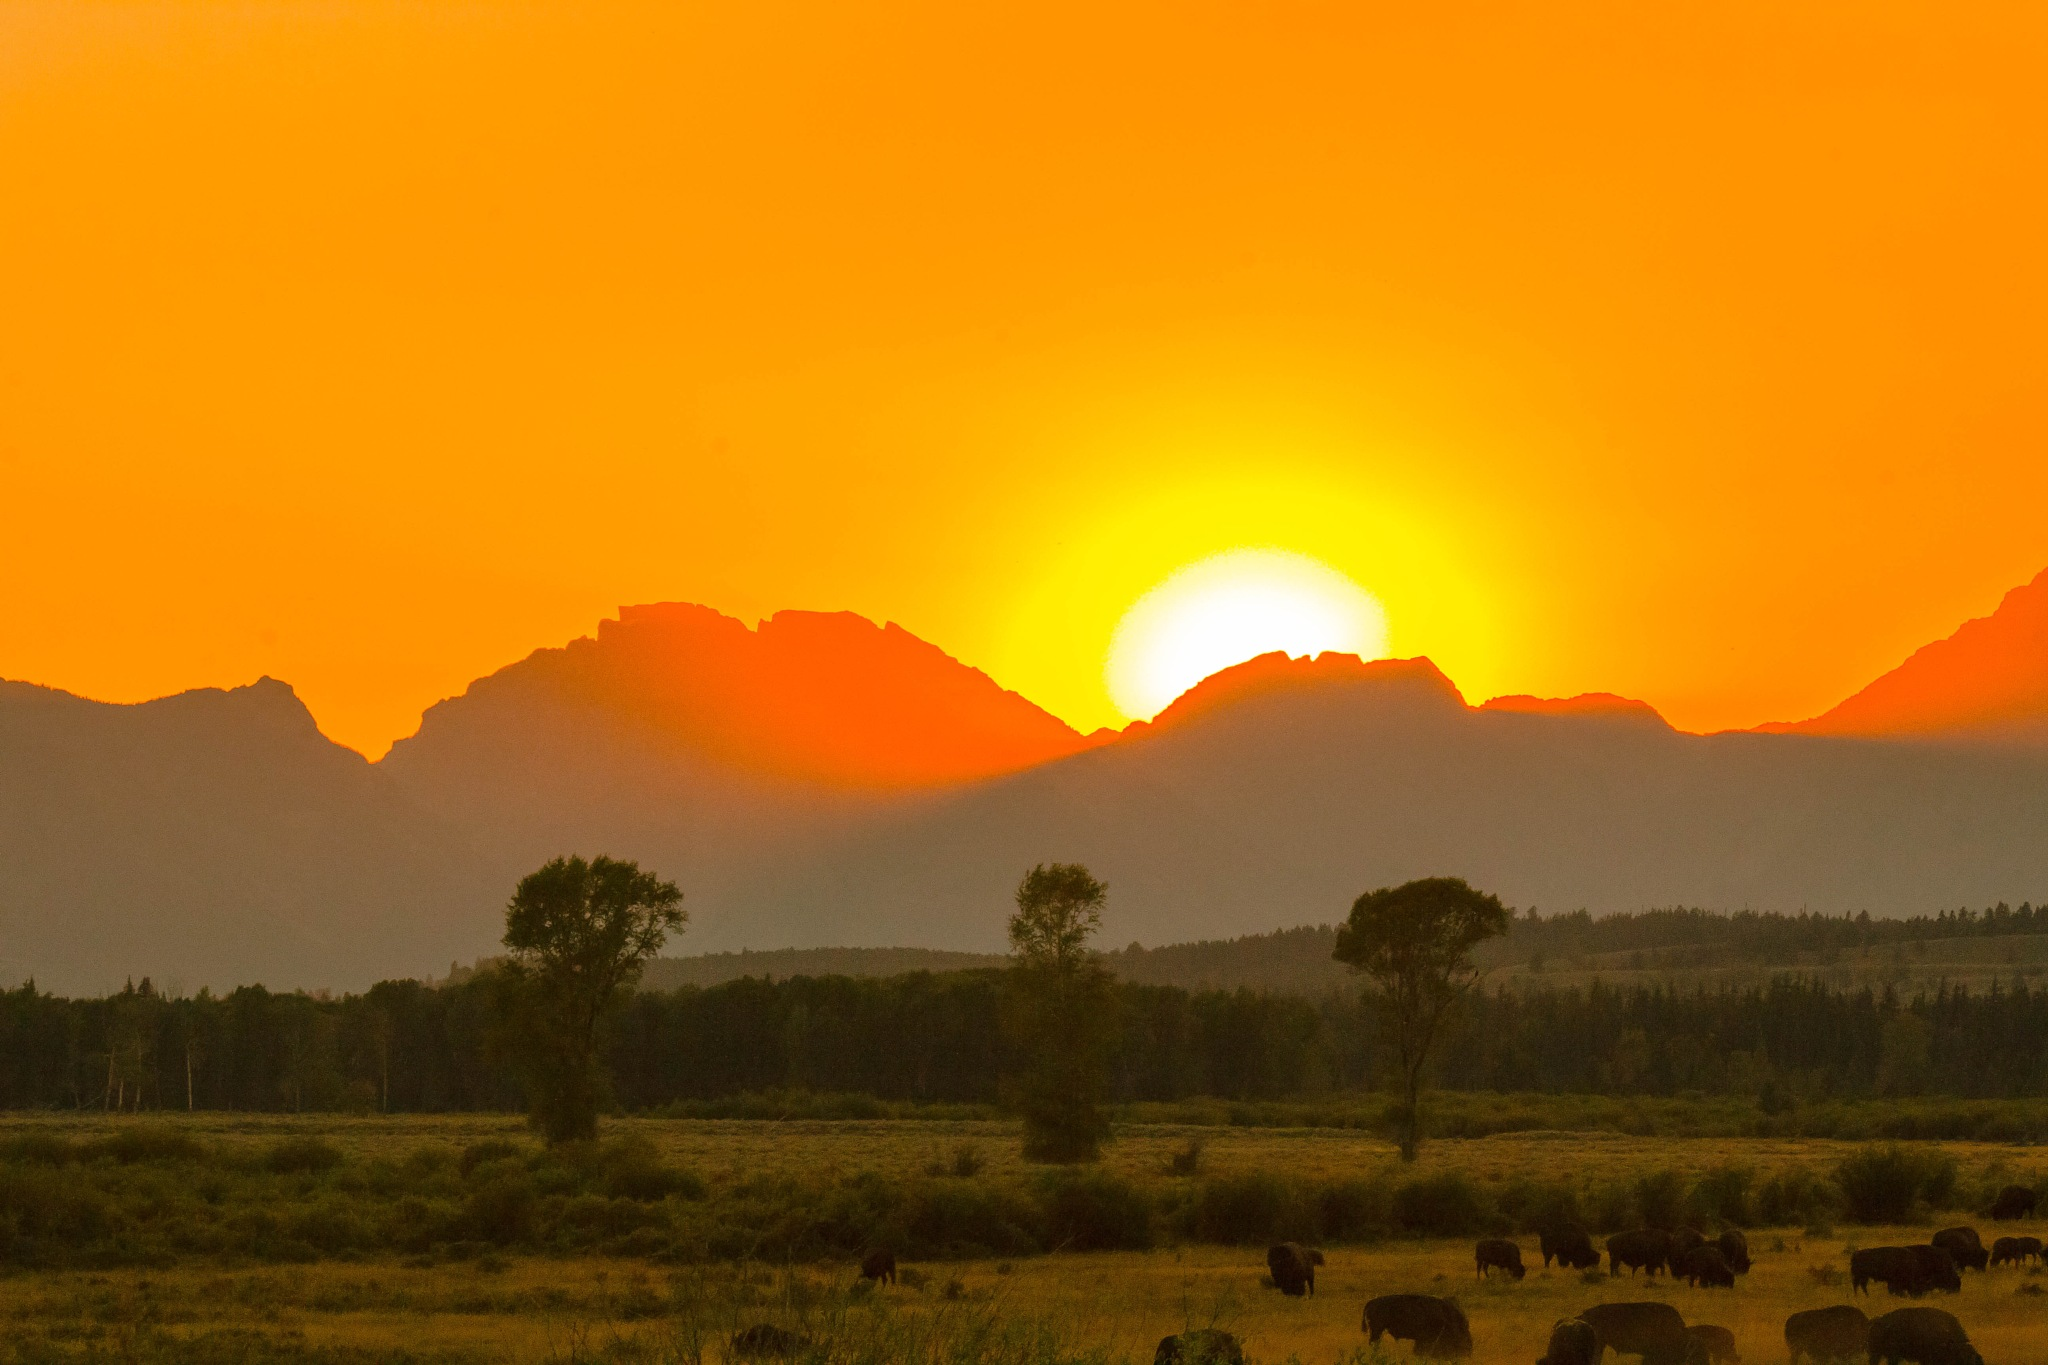 TETON SUNSET by lisa.simons2